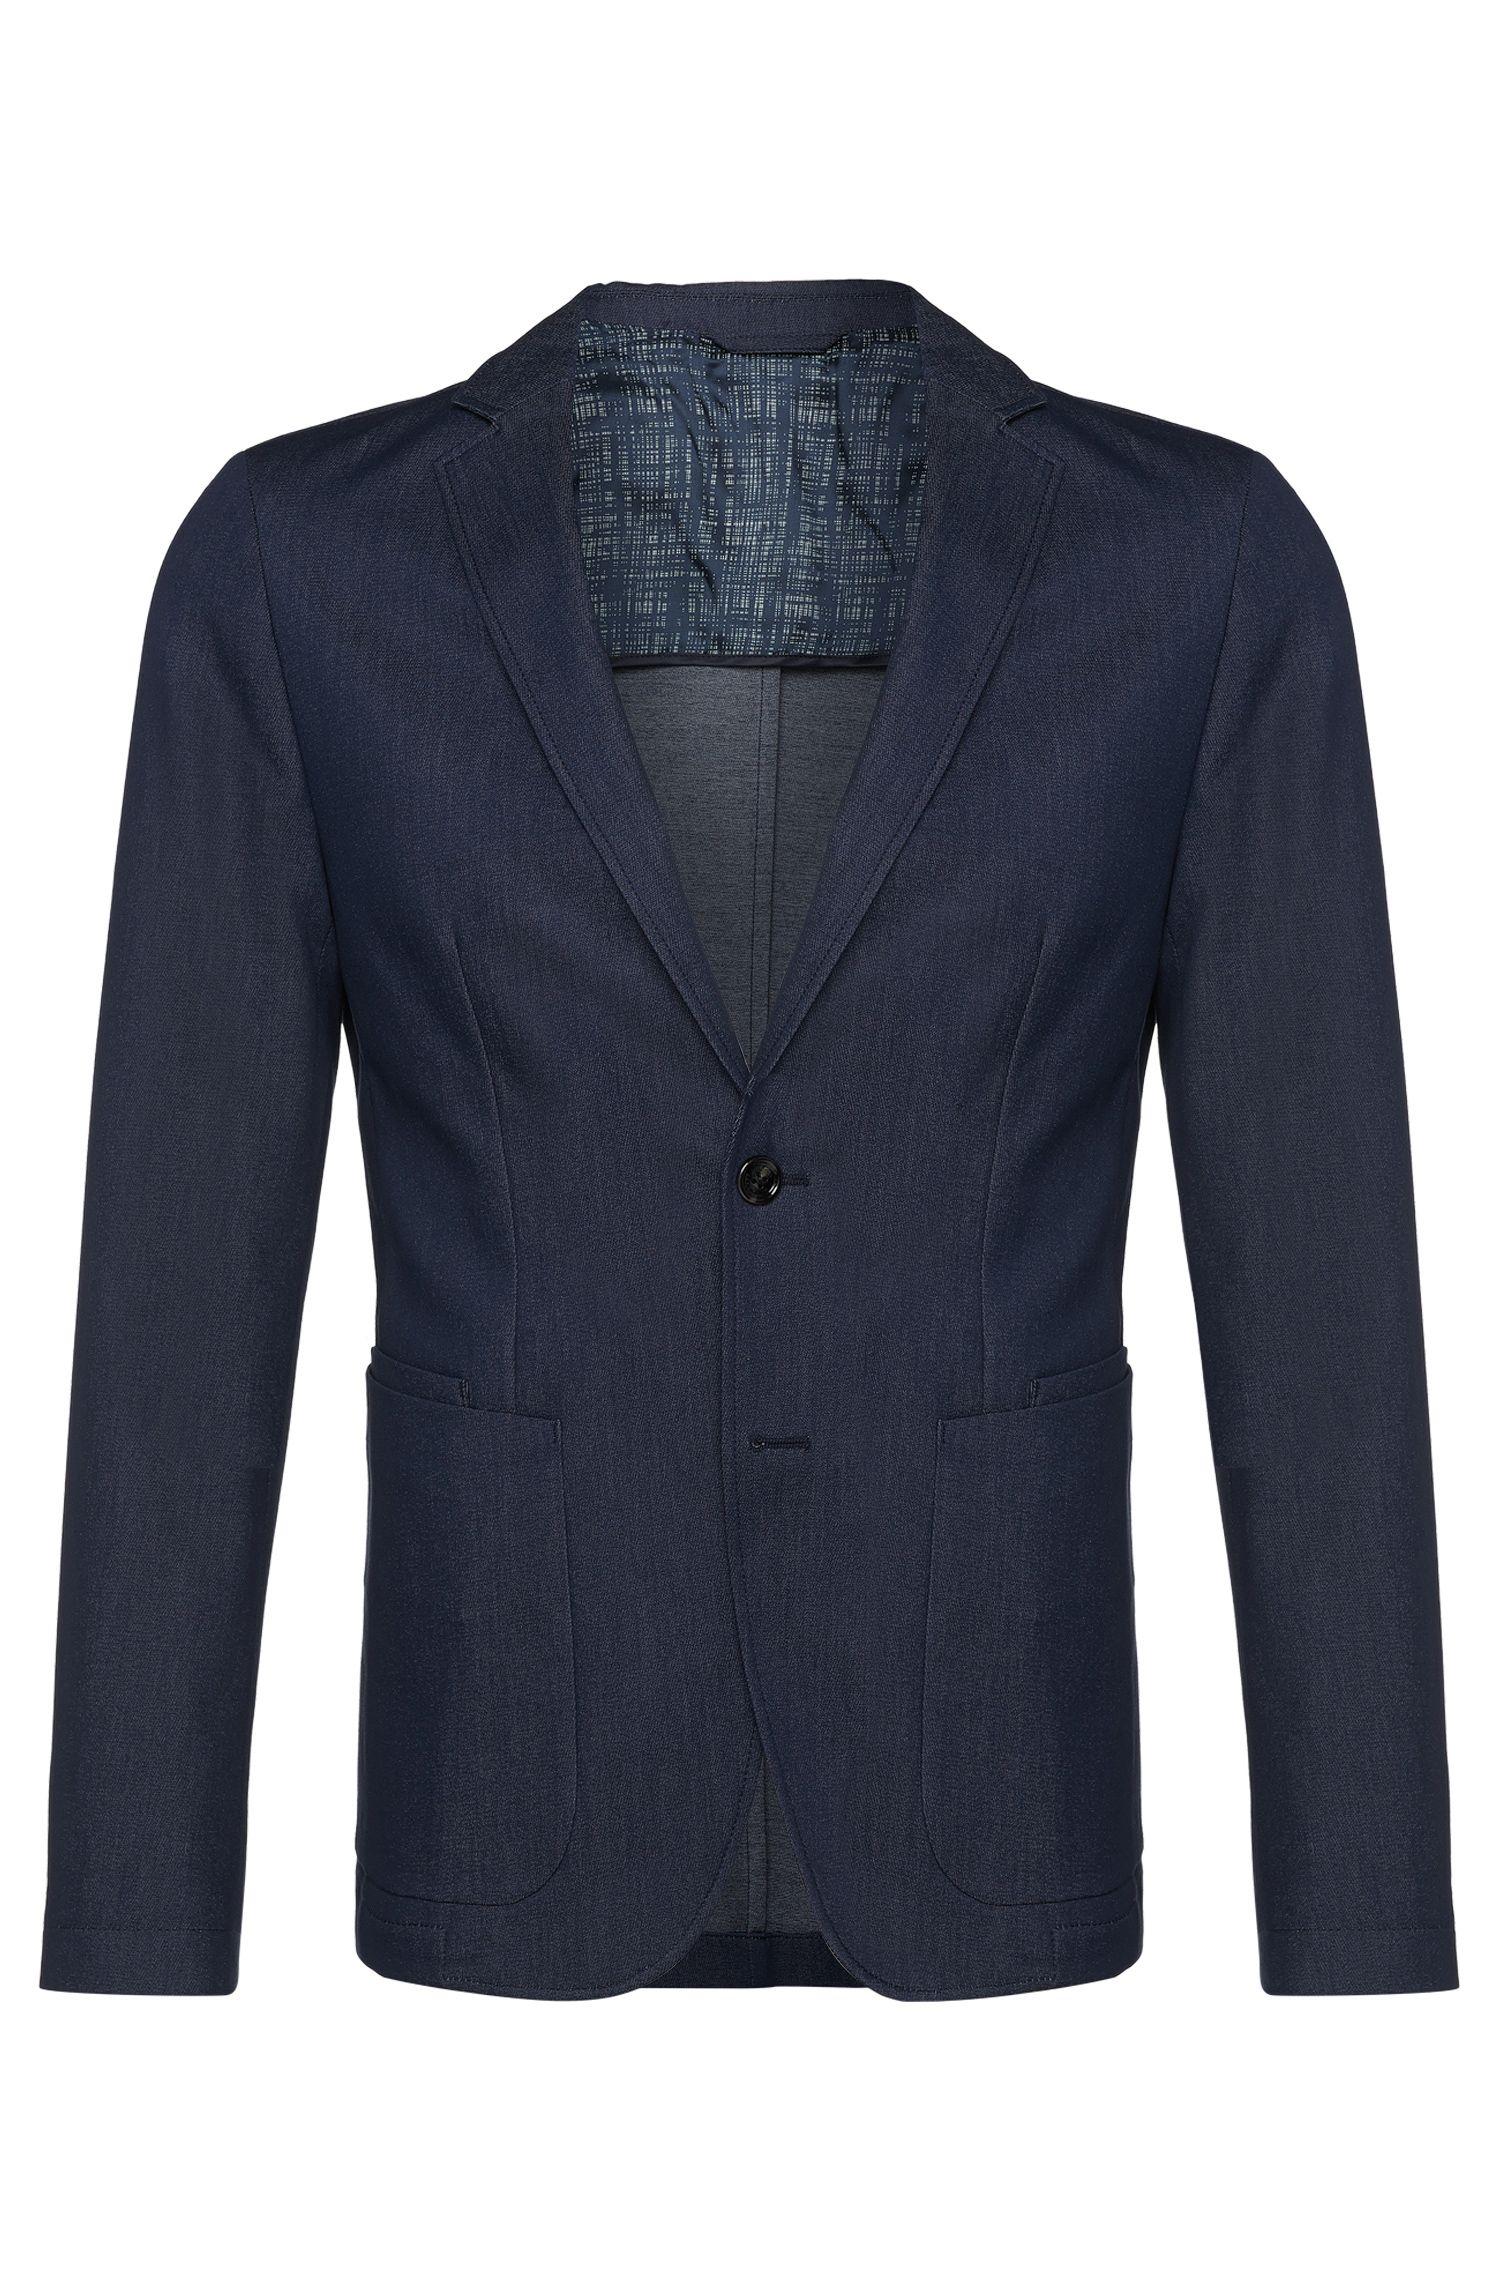 'Mourize' | Extra Slim Fit, Stretch Cotton Denim Sport Coat